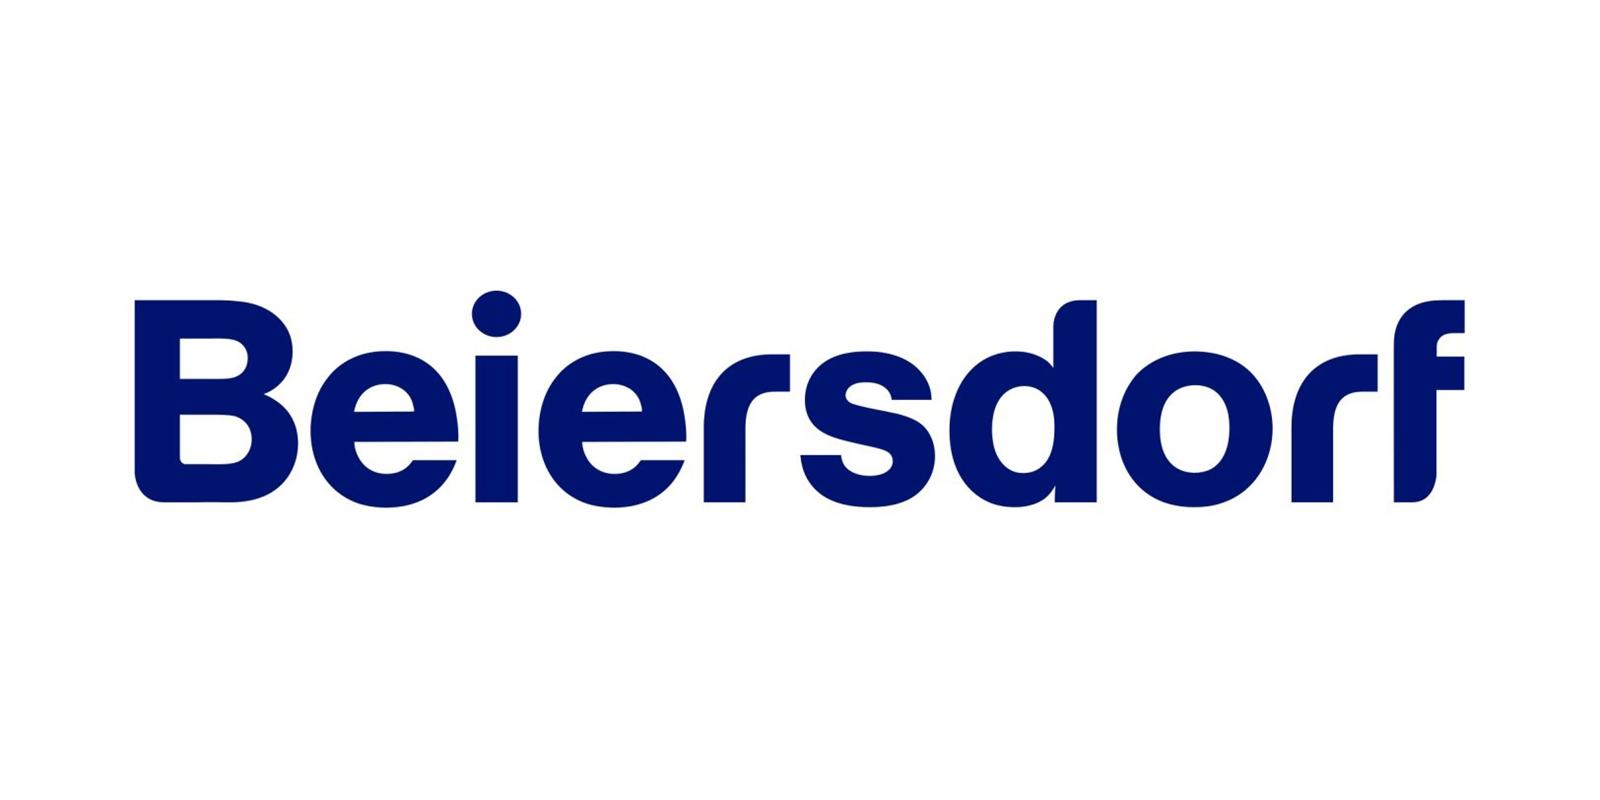 Beiersdorf-neues-logo_1600x800.jpg